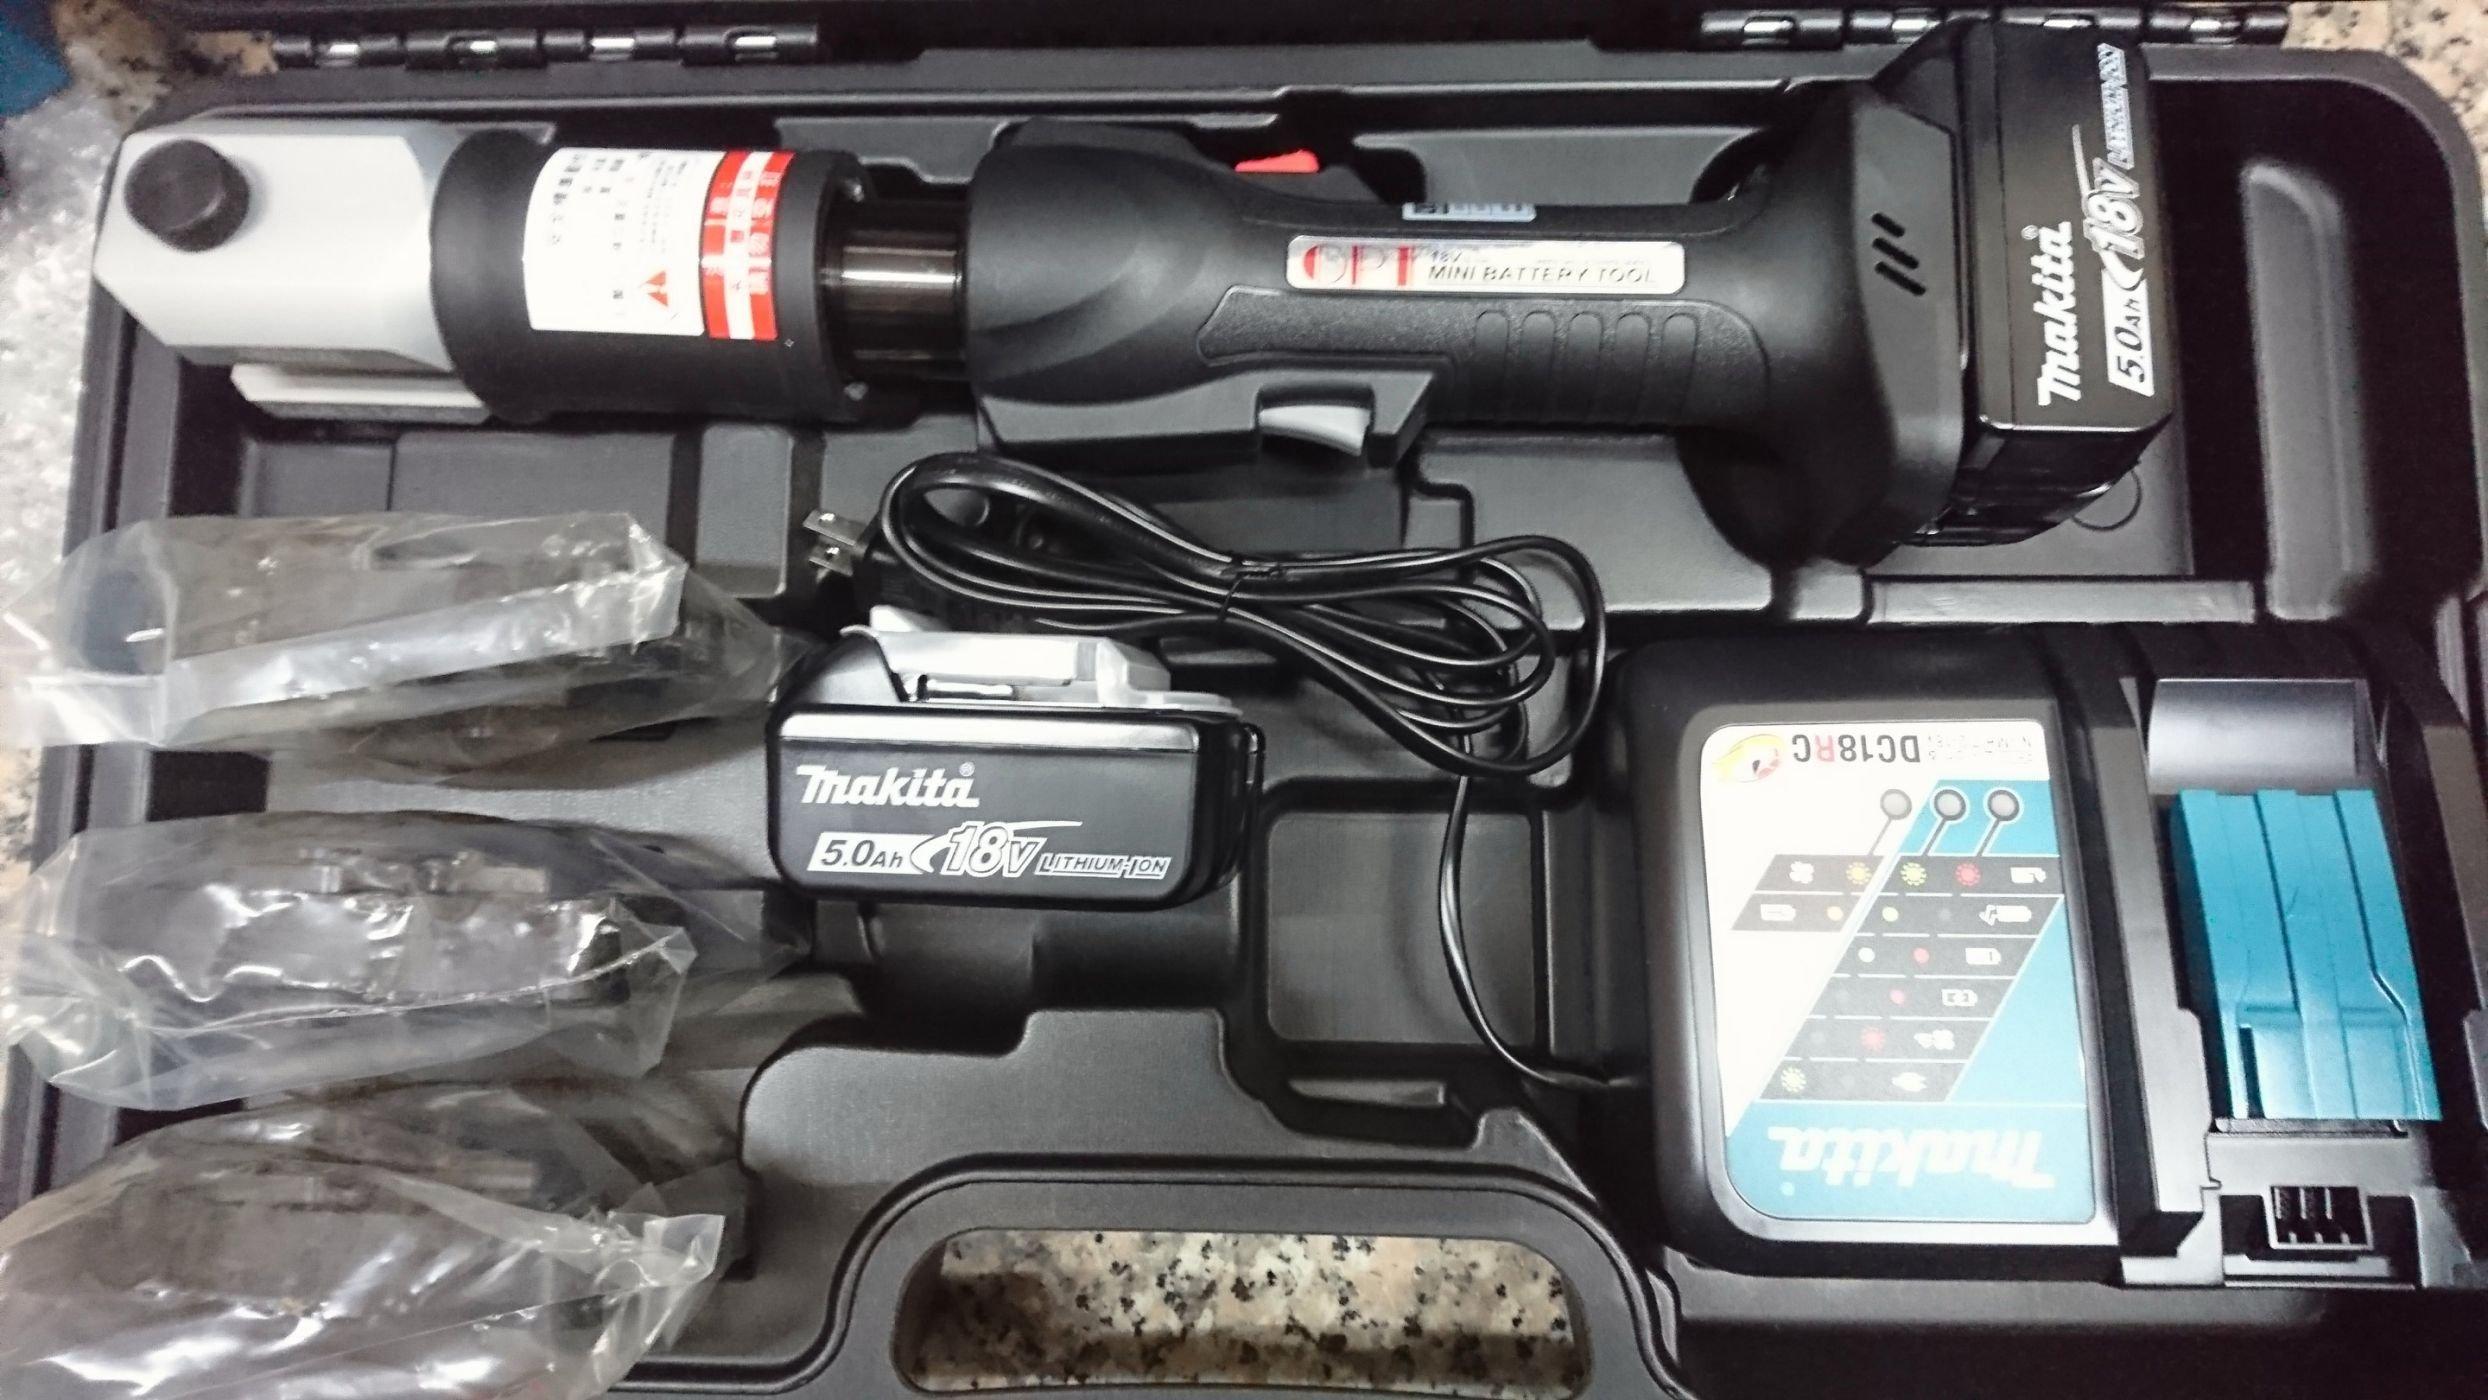 (my工具)OPT18v充電式白鐵管壓接機 台灣製 雙牧田5.0AH電池 來電有優惠 ROLLER ASADA